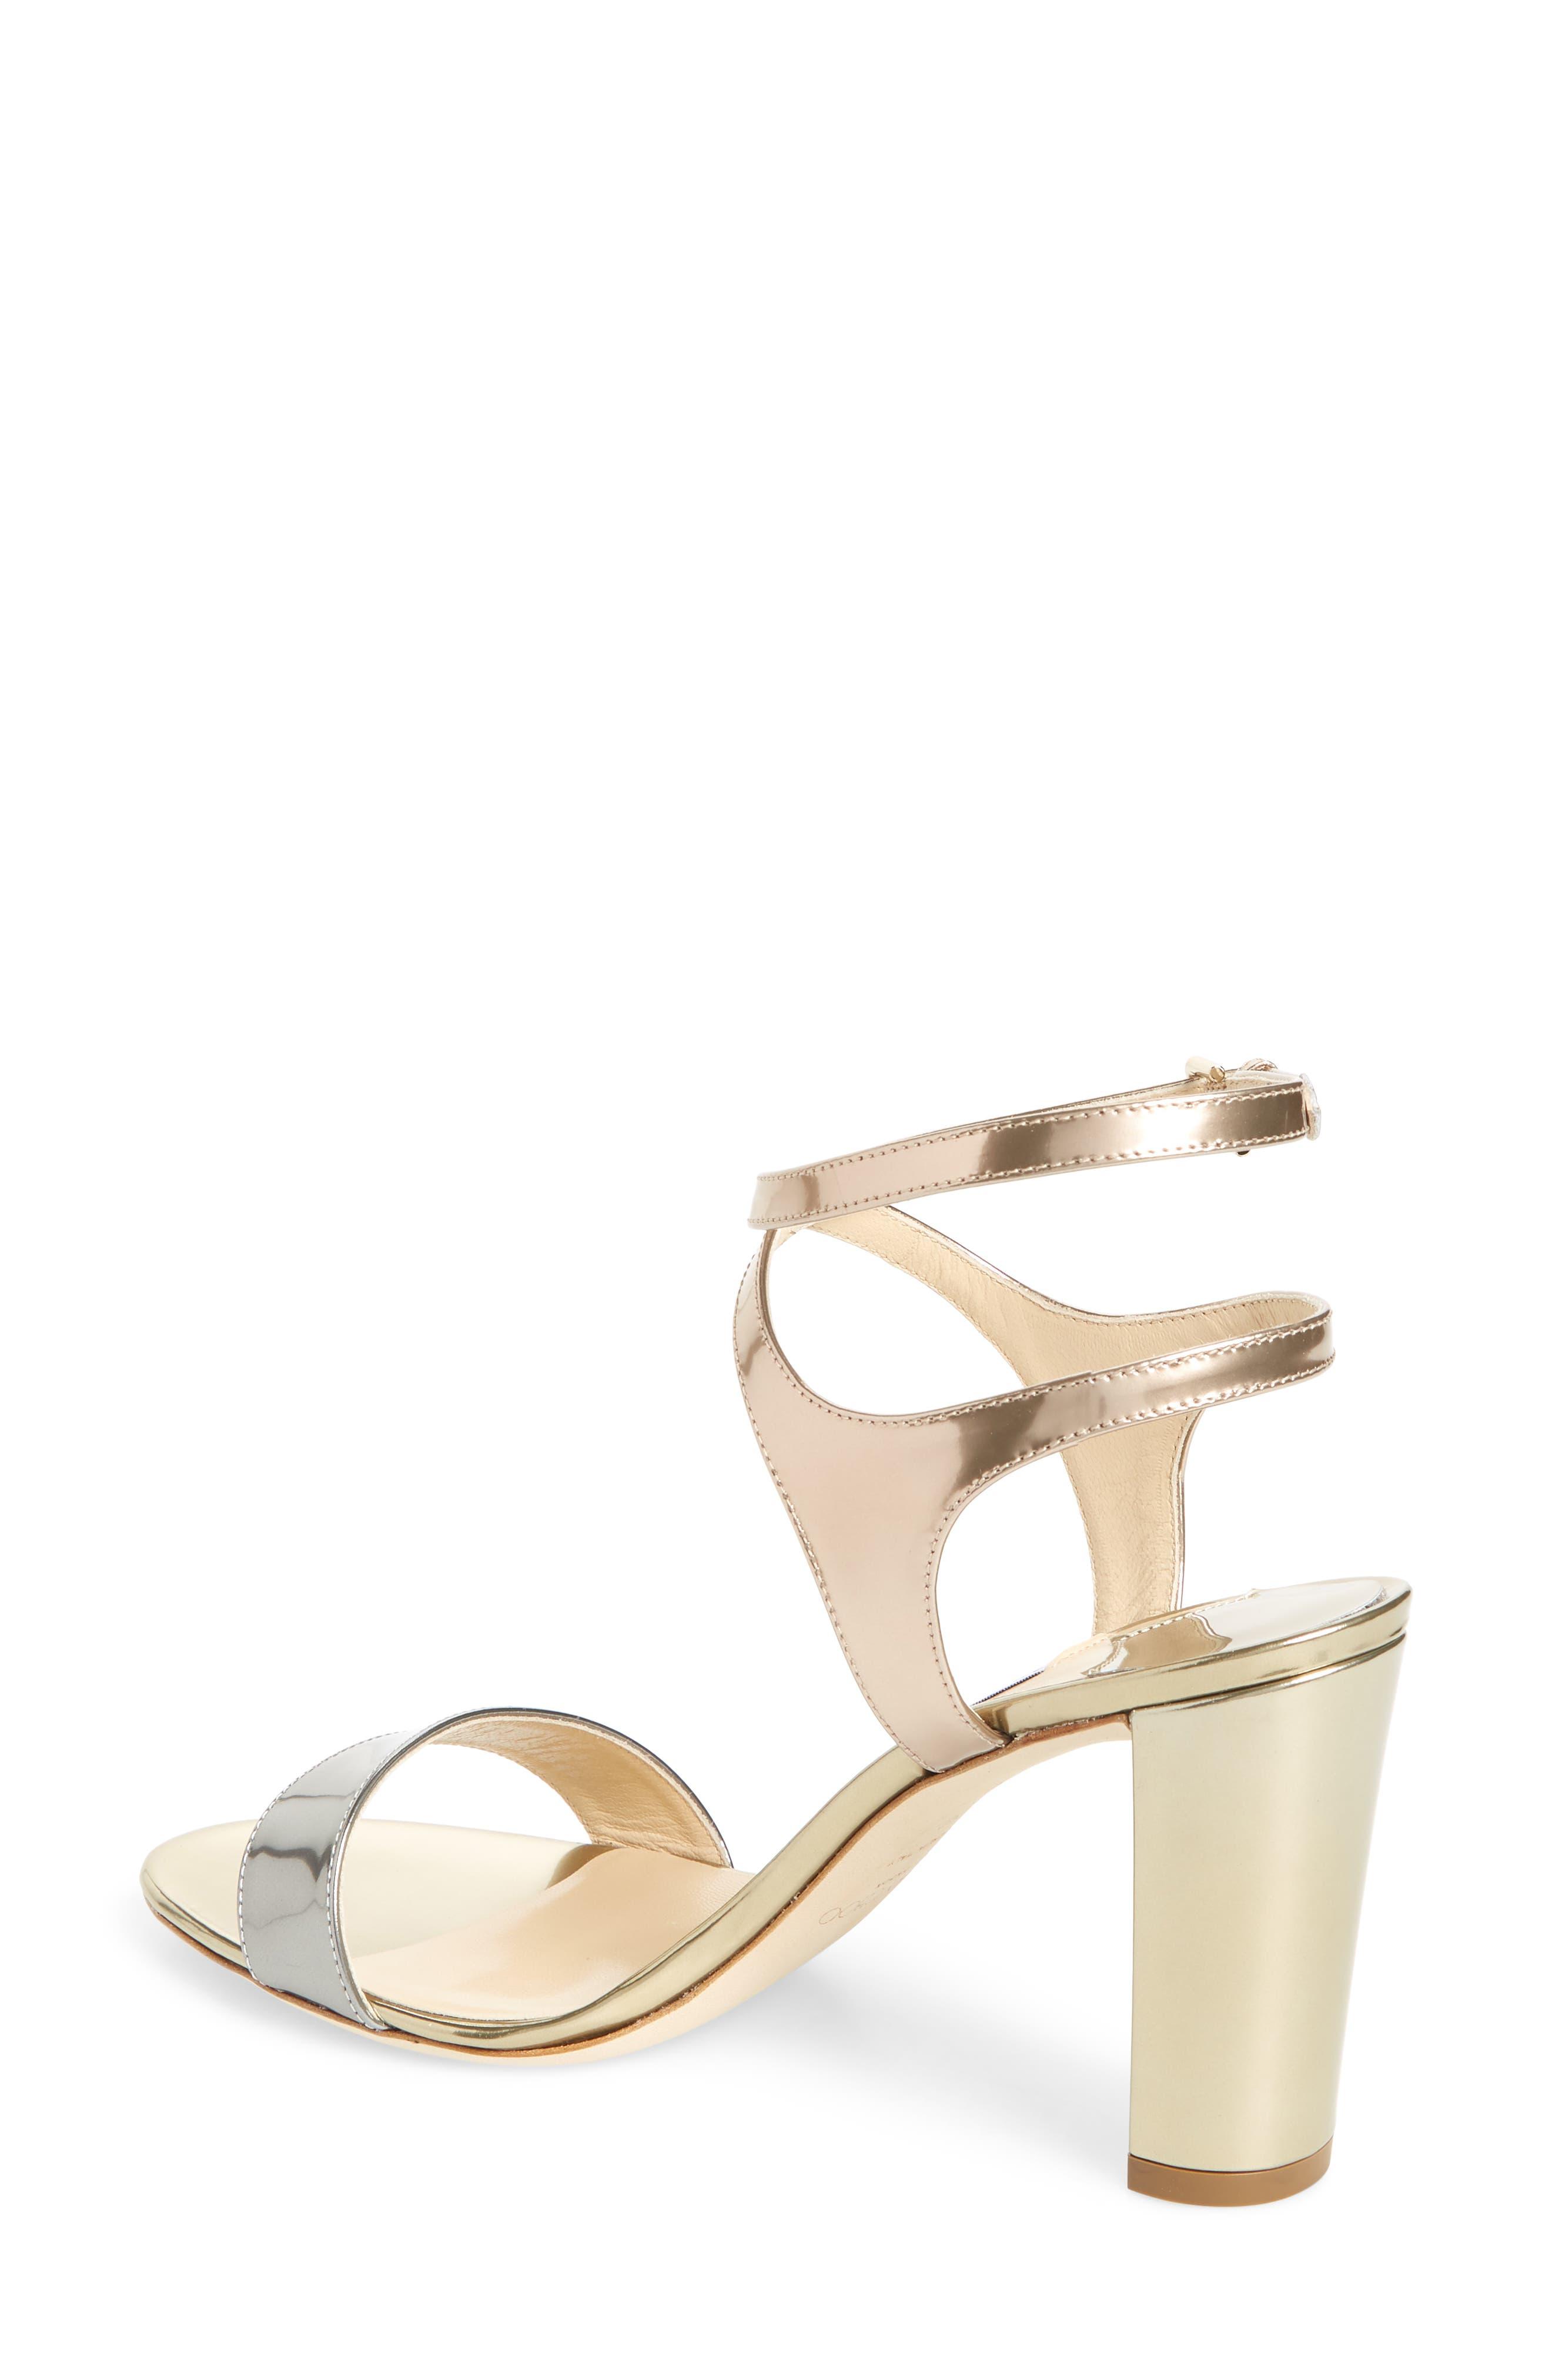 Marine Sandal,                             Alternate thumbnail 2, color,                             Gold